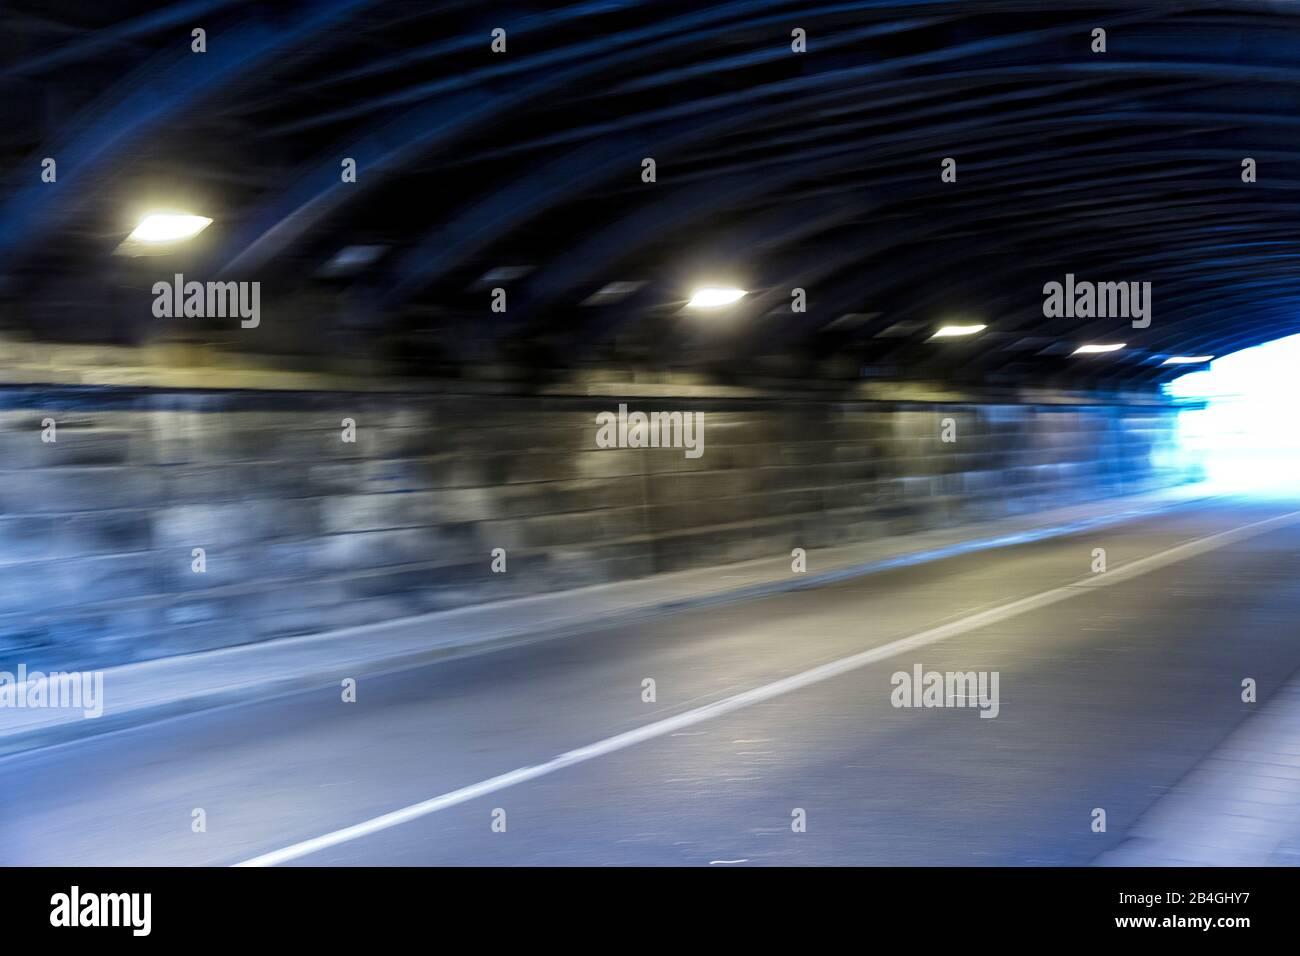 Tunnel, Motion, Blur, Lighting, Eisenach, Thuringia, Germany, Europe, Stock Photo